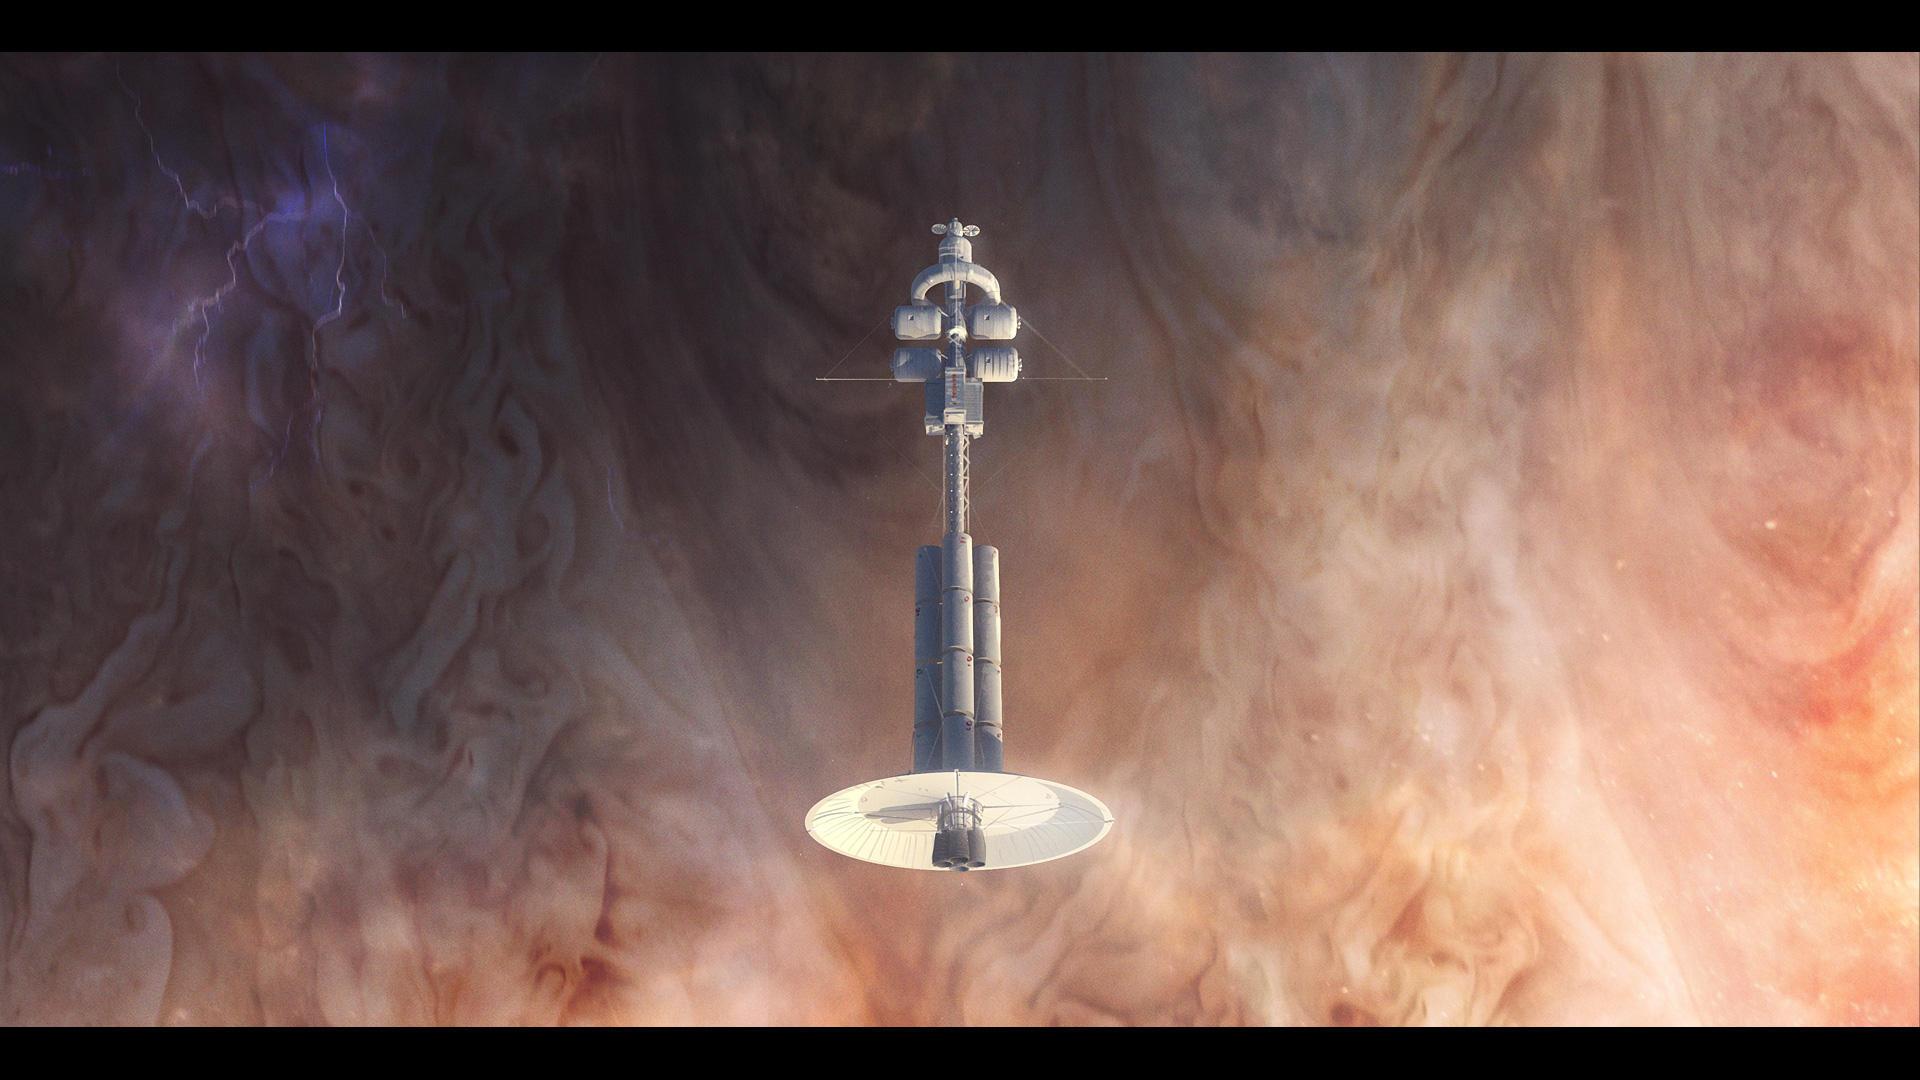 Heimdall 1 over Jupiter by MacRebisz